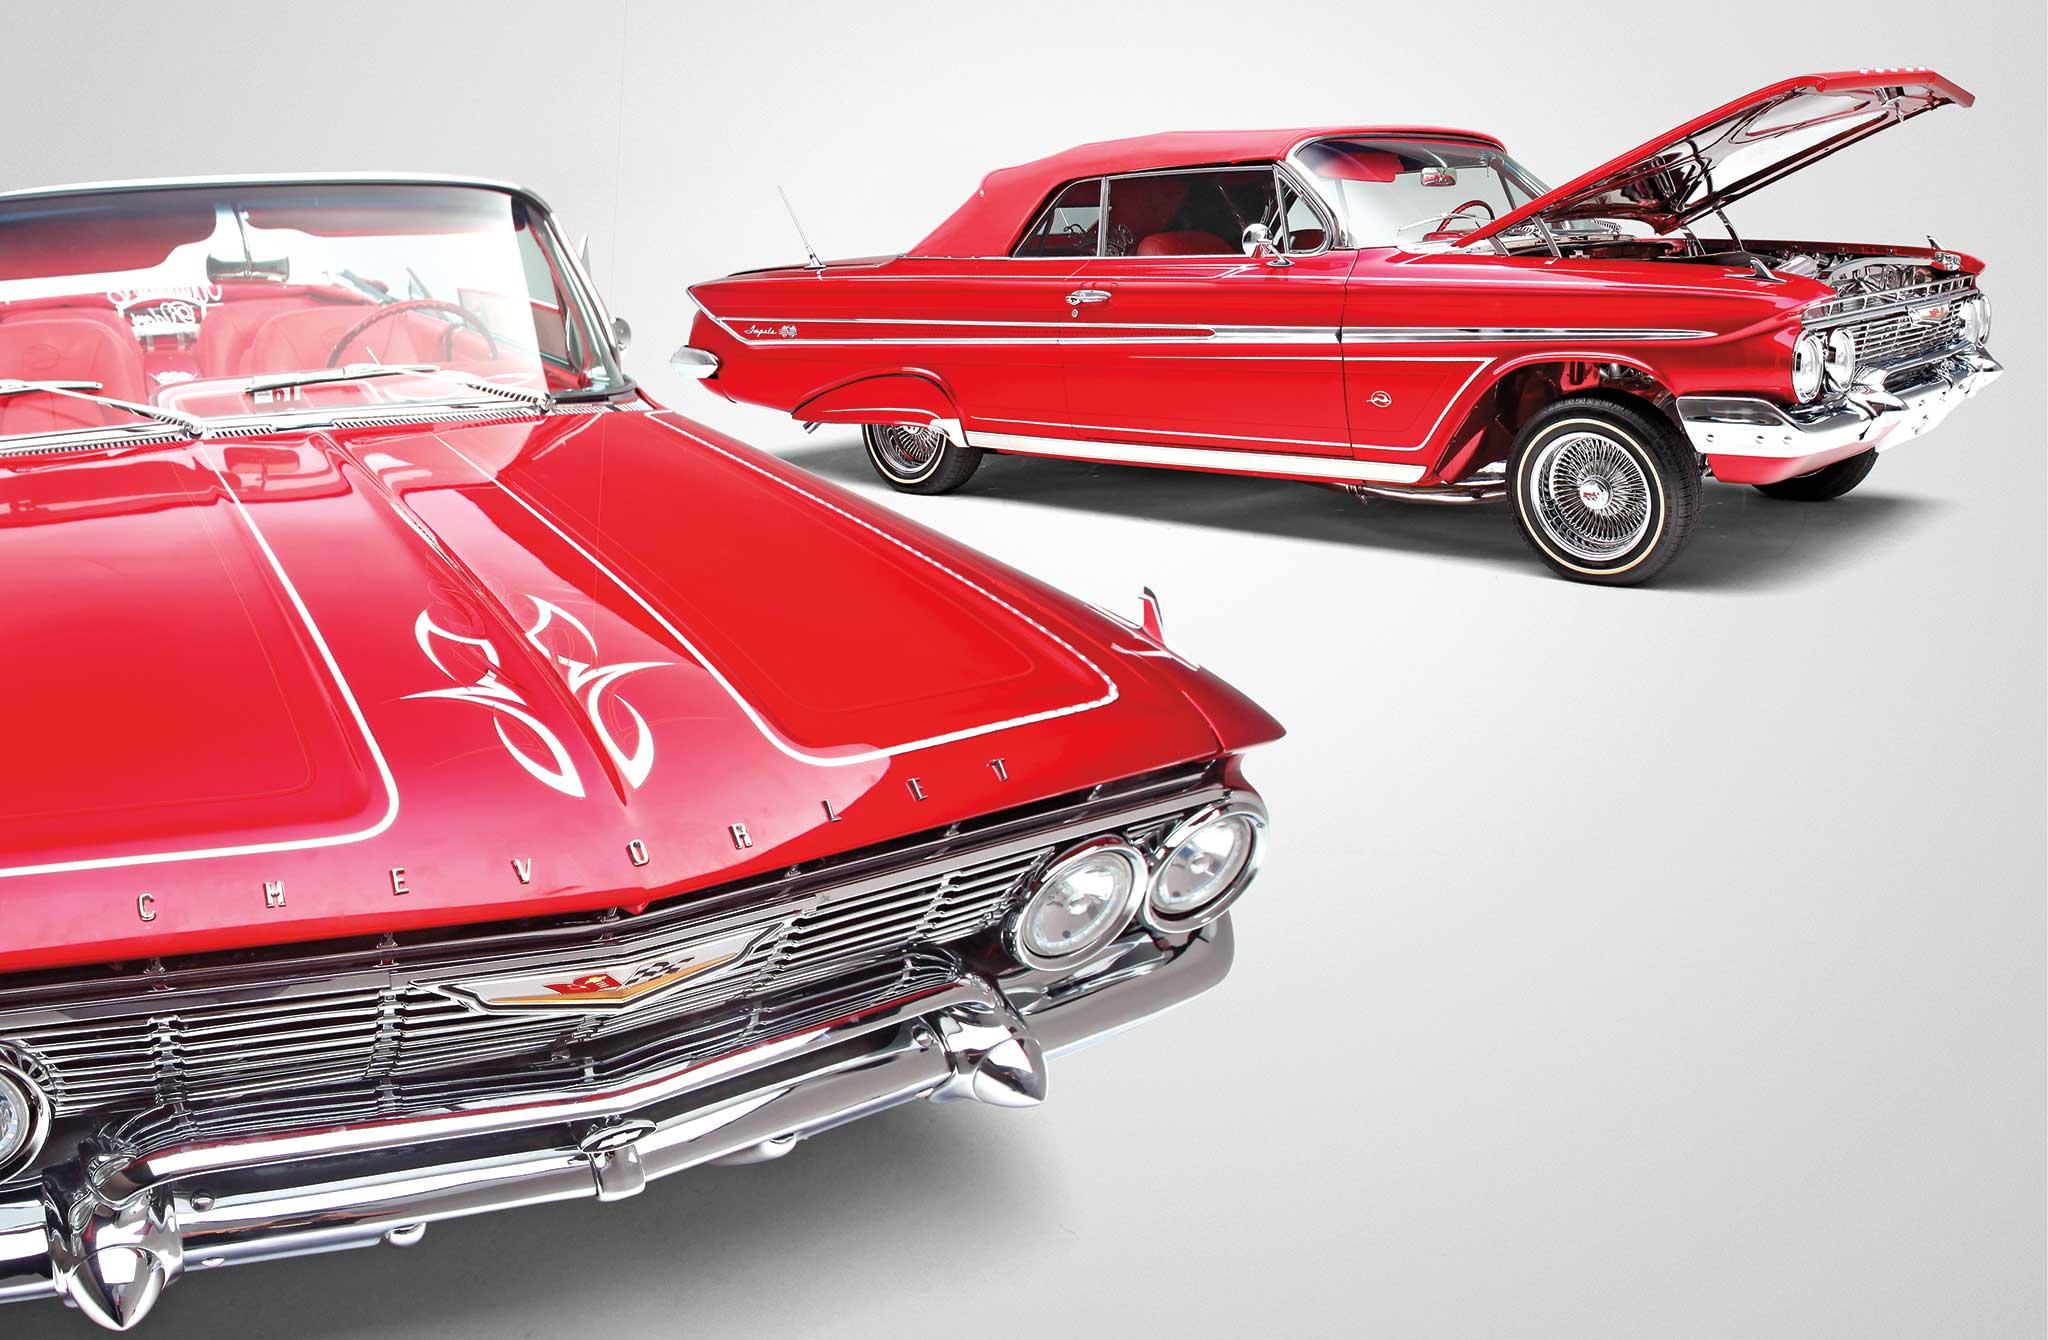 1961 chevrolet impala convertible true love lowrider. Black Bedroom Furniture Sets. Home Design Ideas